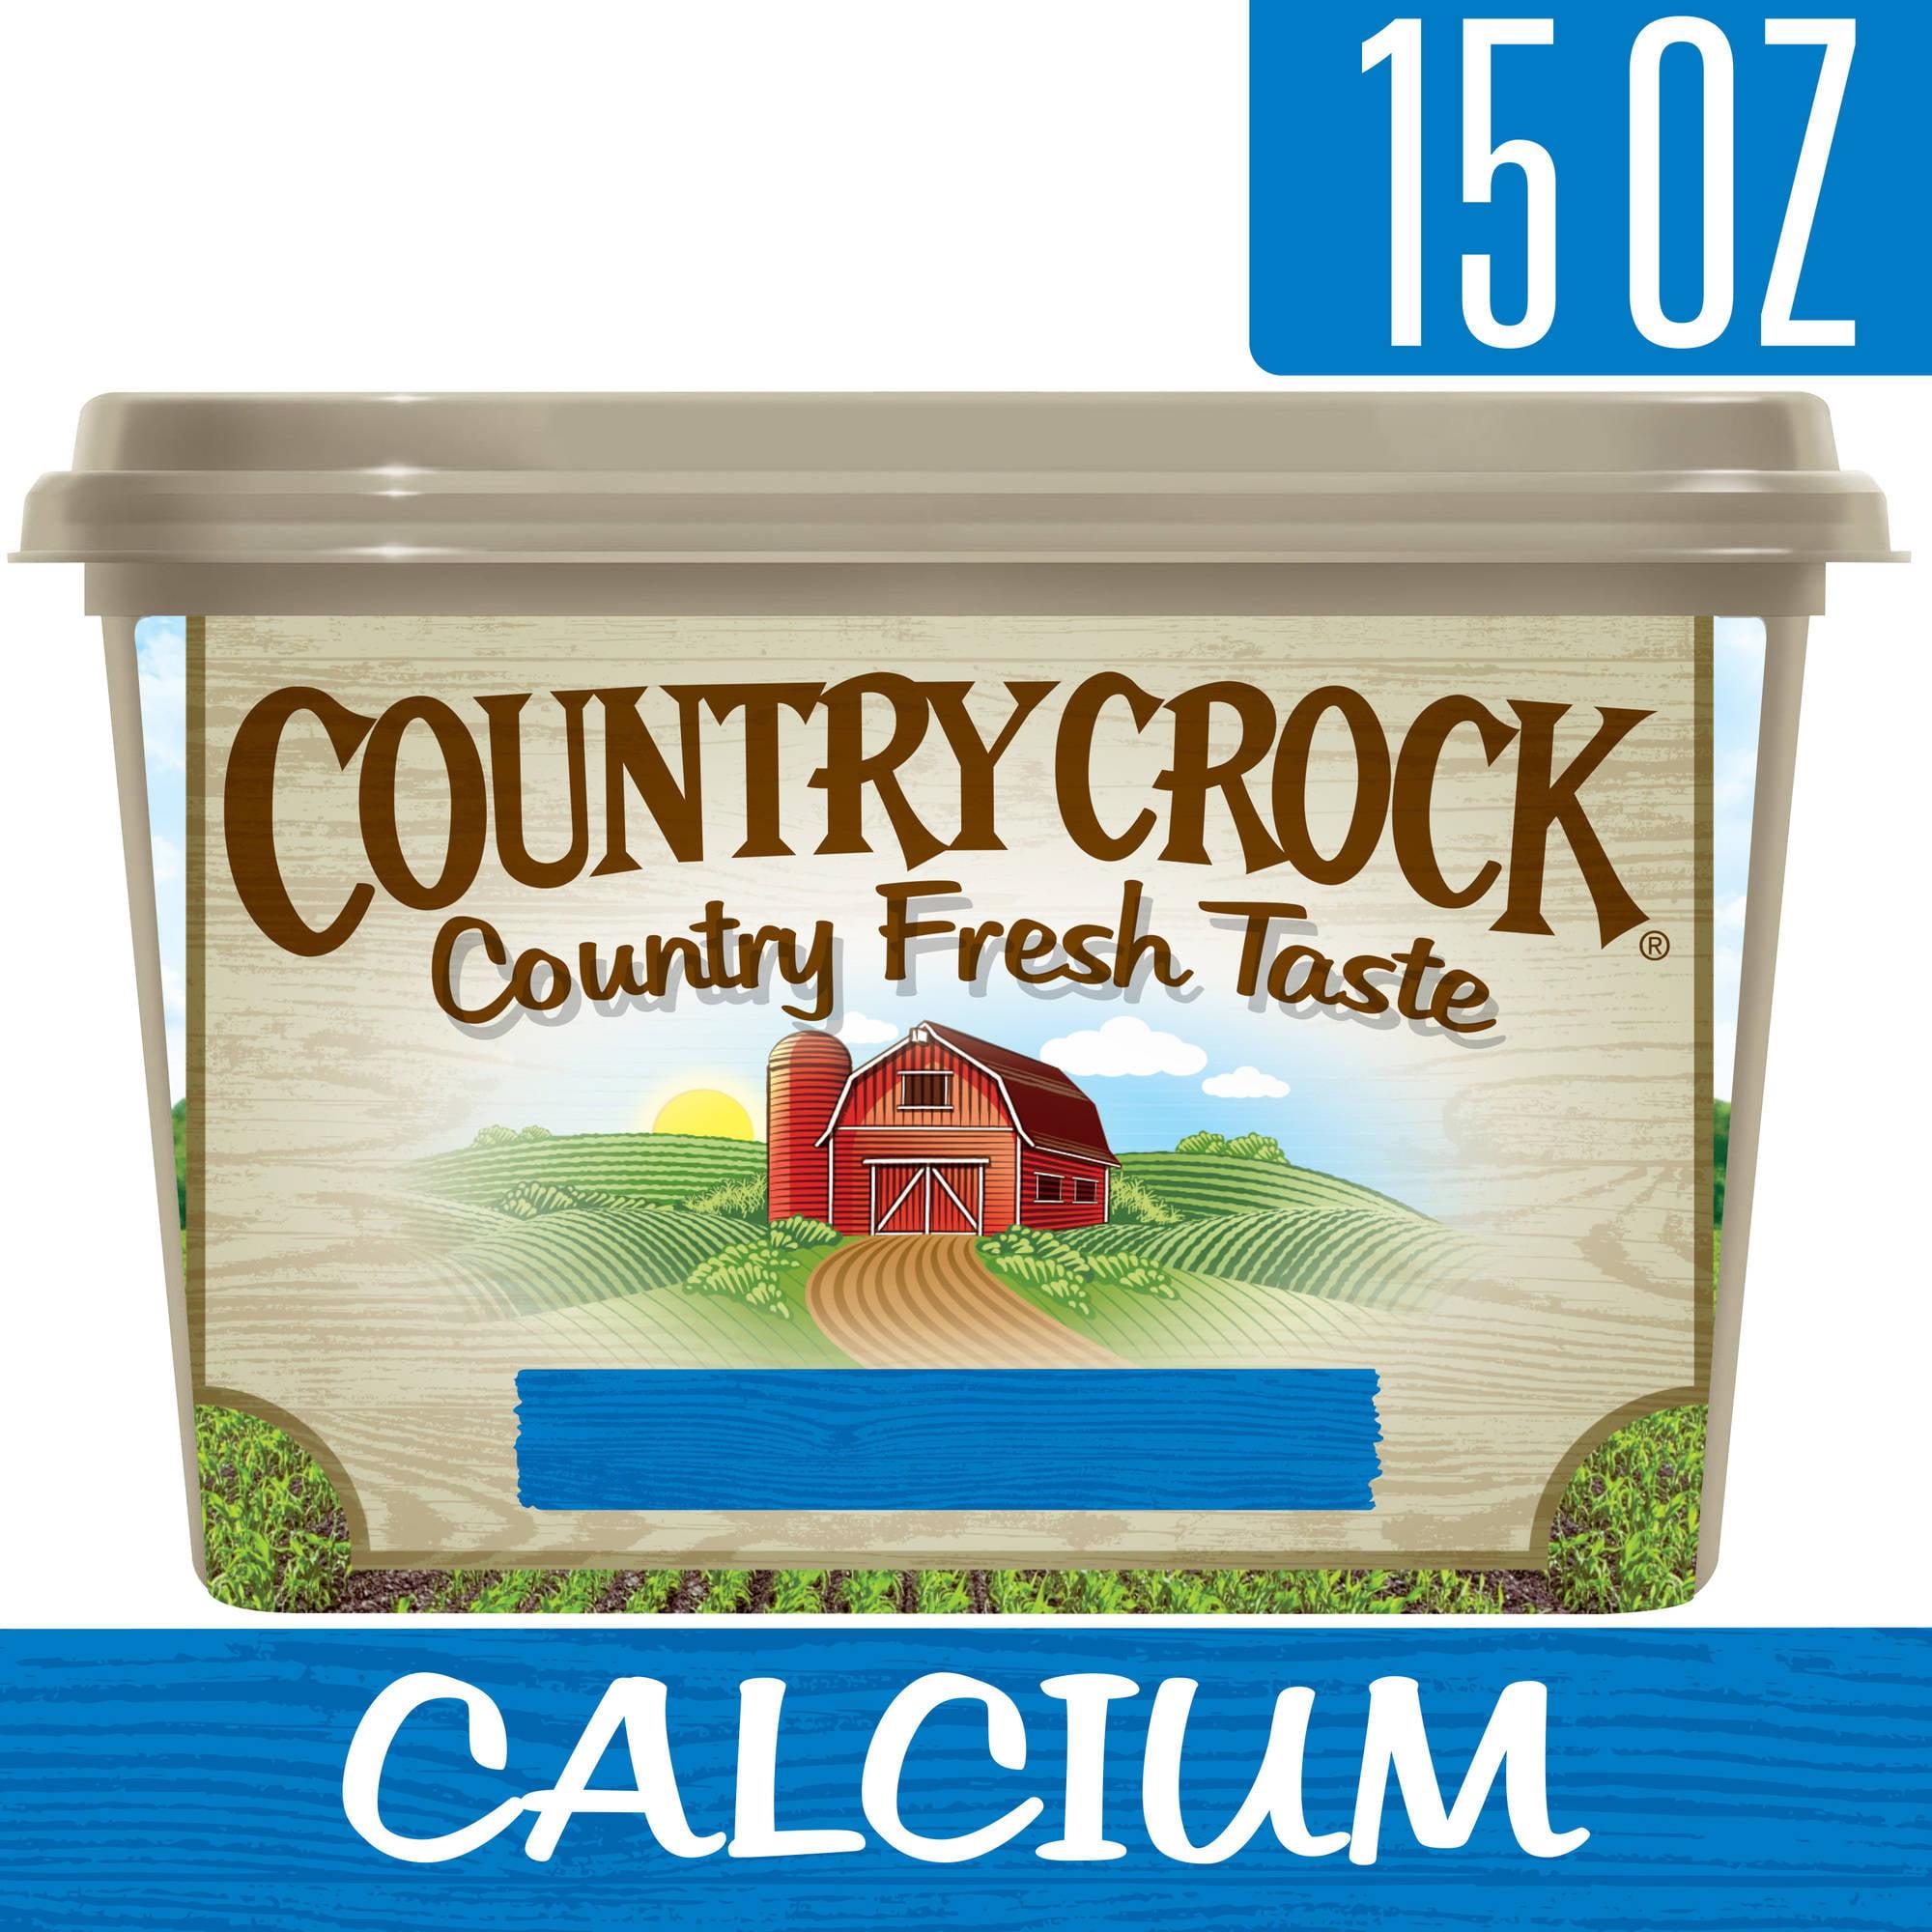 Country Crock Calcium Vegetable Oil Spread Tub, 15 oz